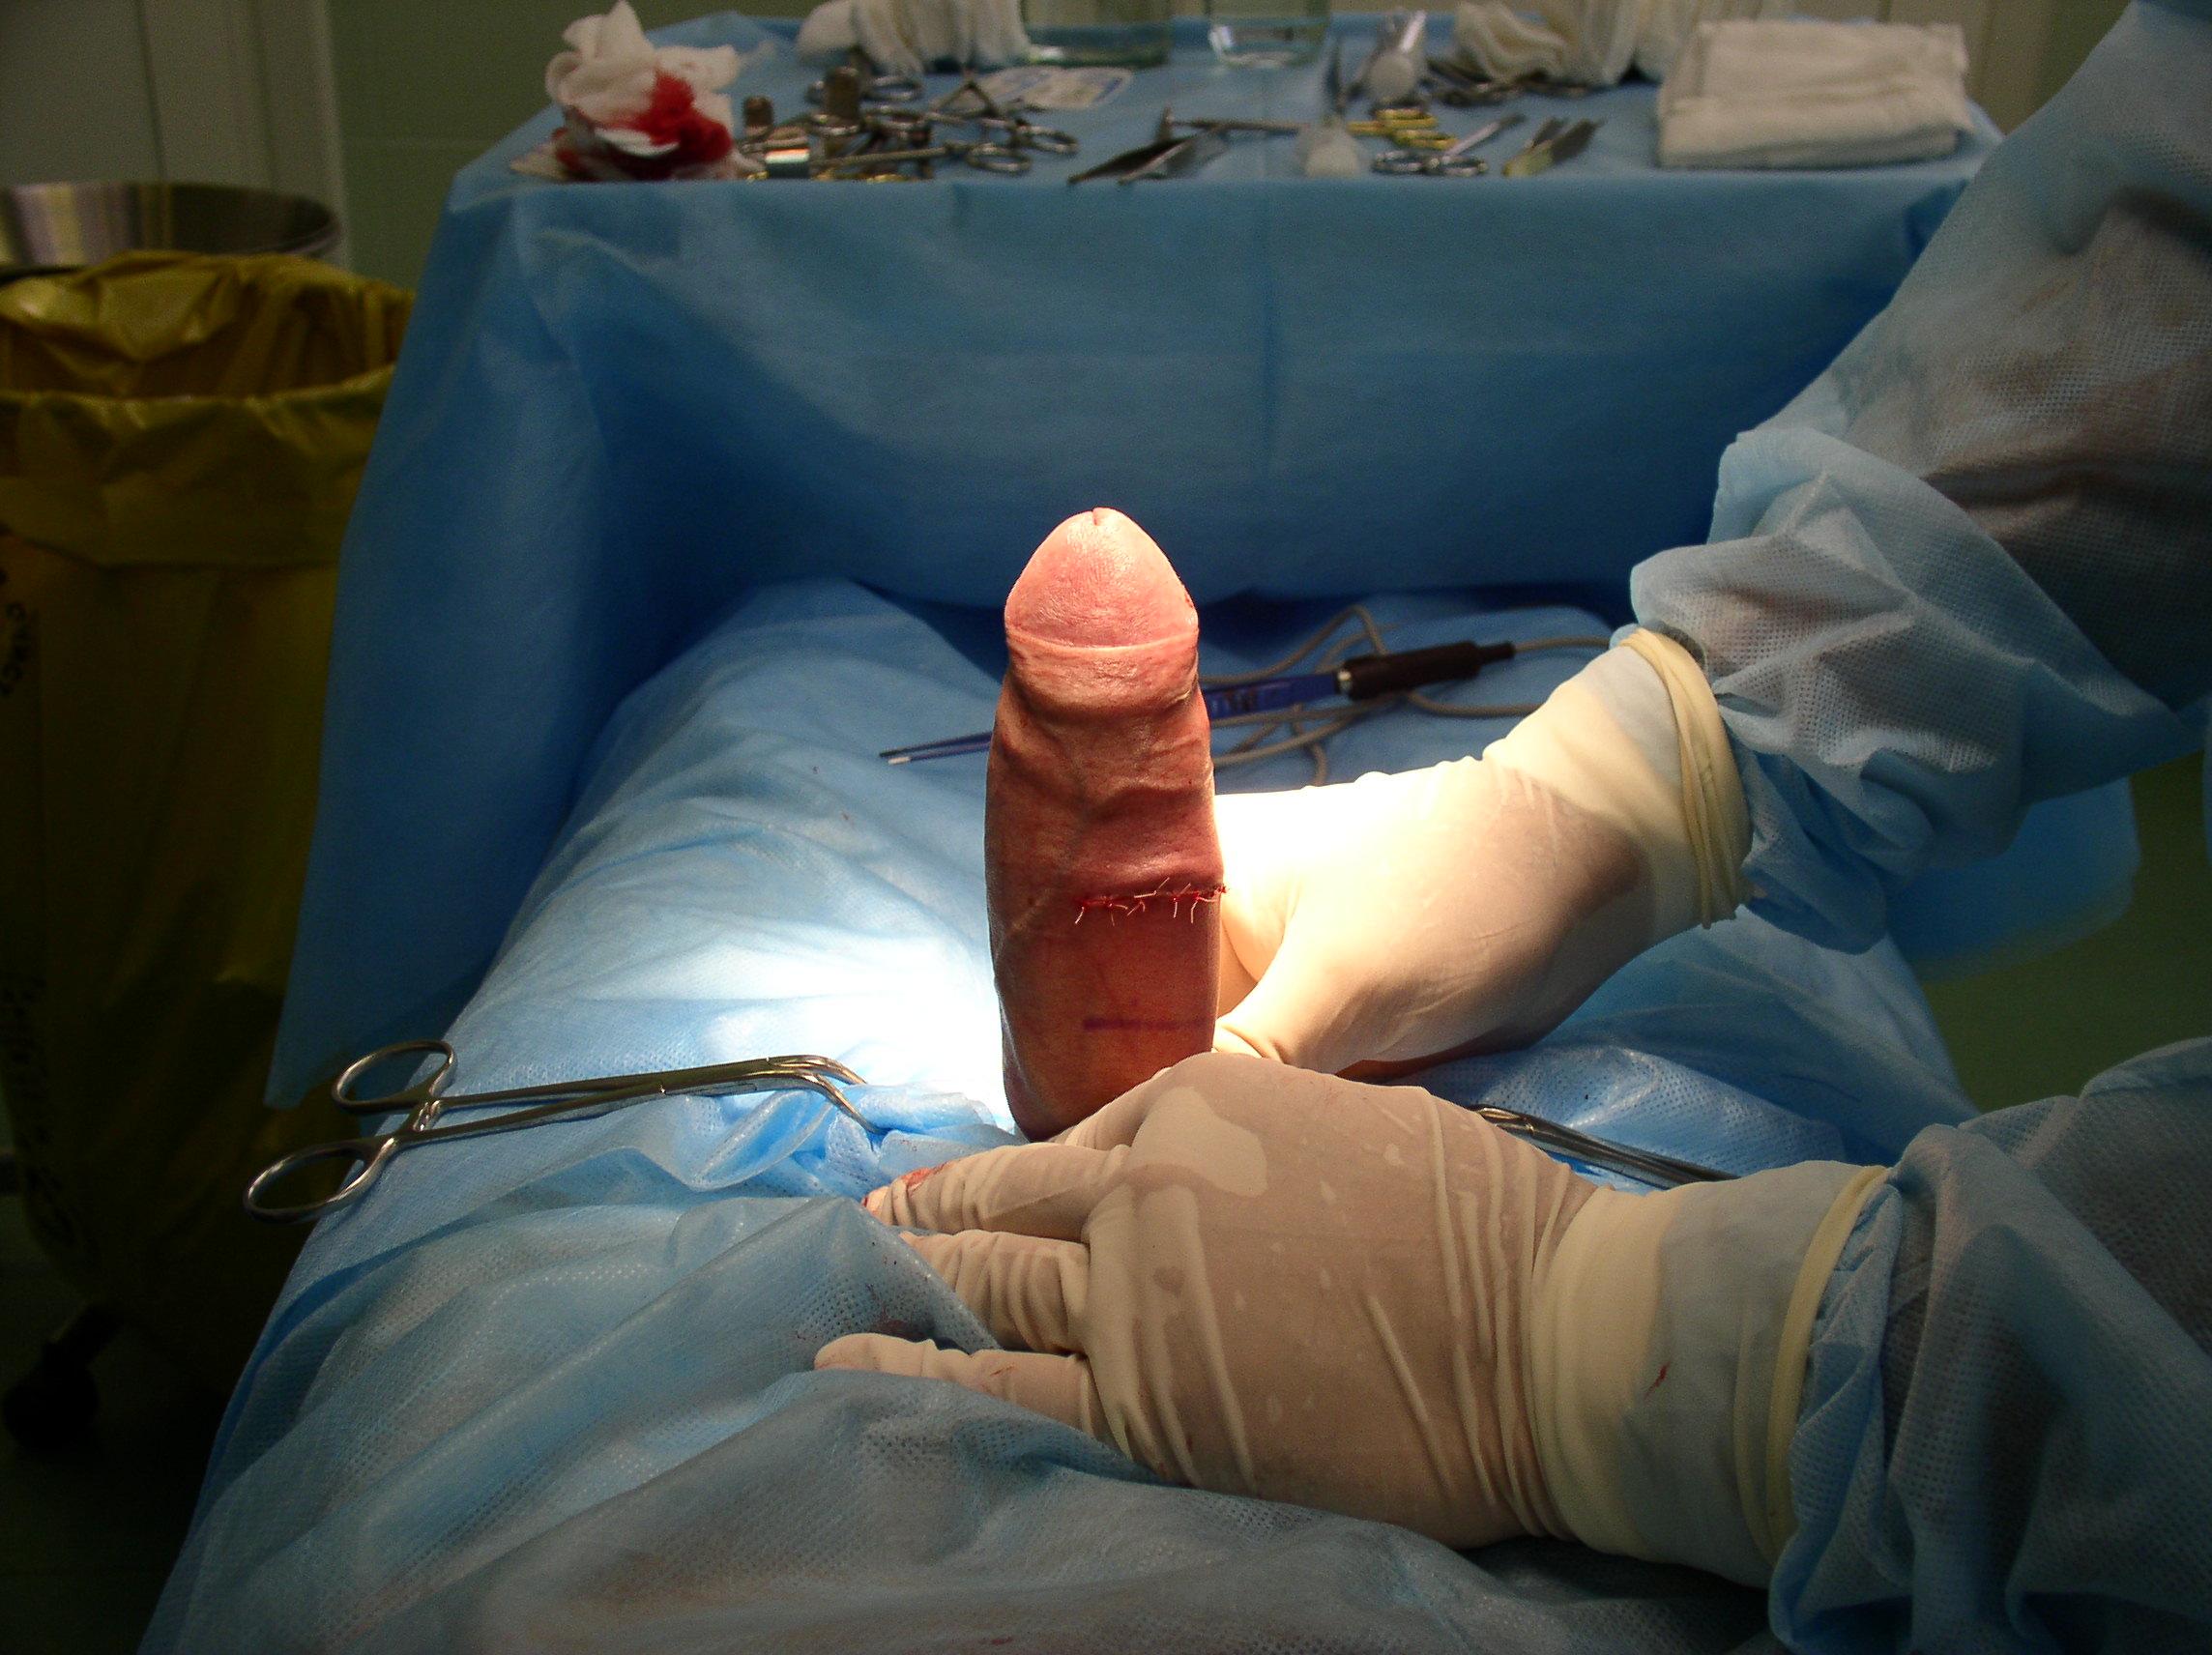 uvelichenie-chlena-hirurgicheskim-metodom